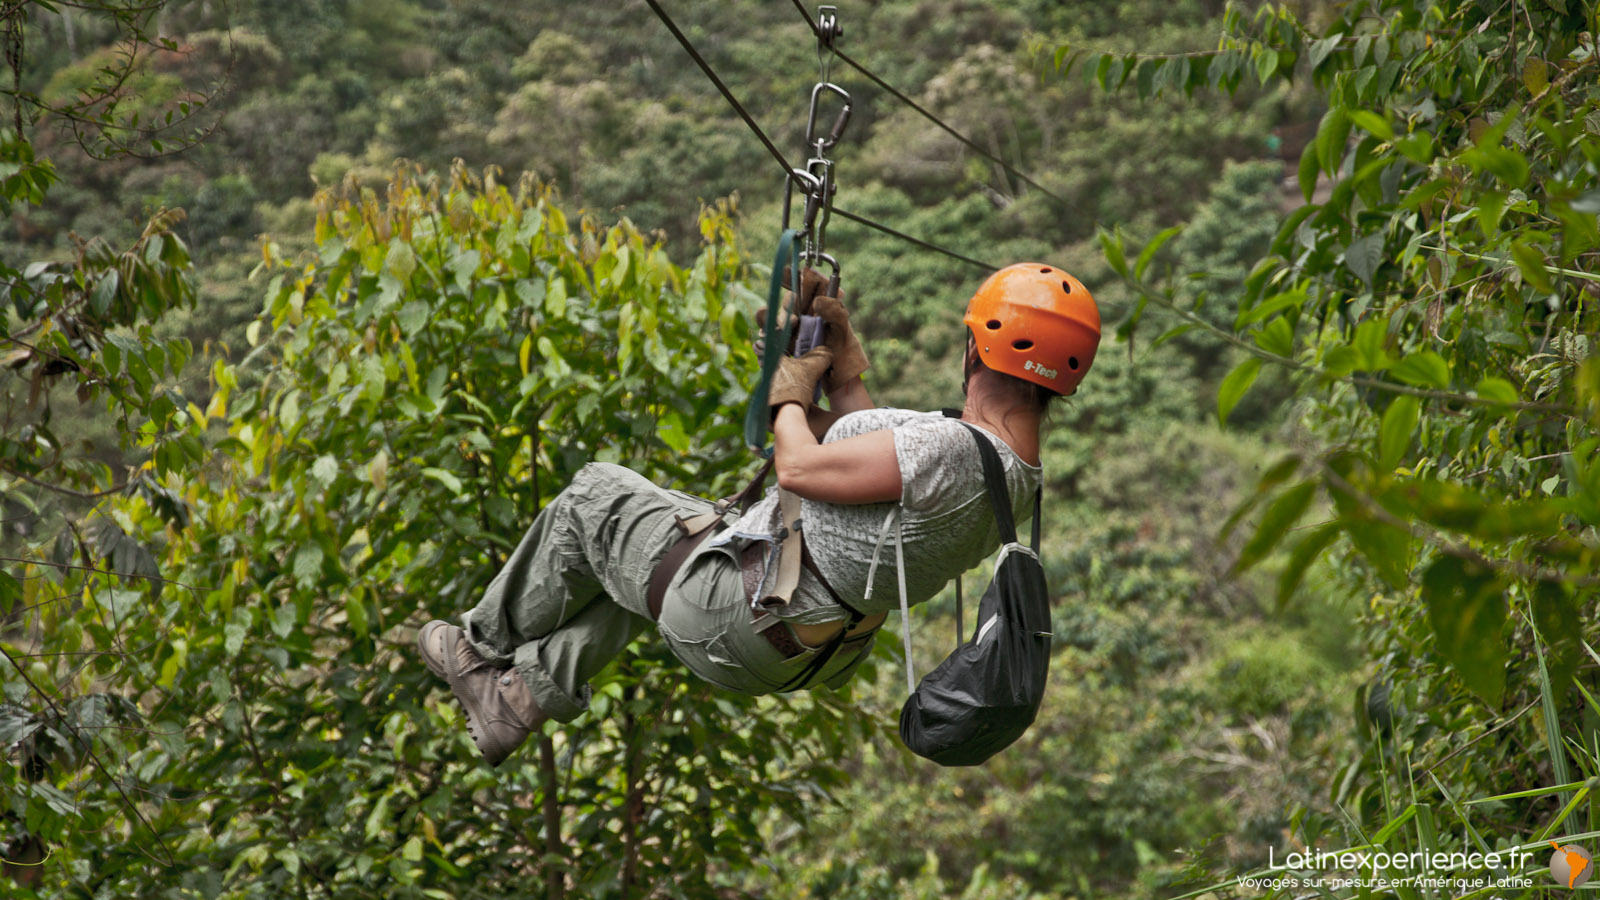 Equateur - Mindo Canopy Adventures - Zipline - Latinexperience voyages